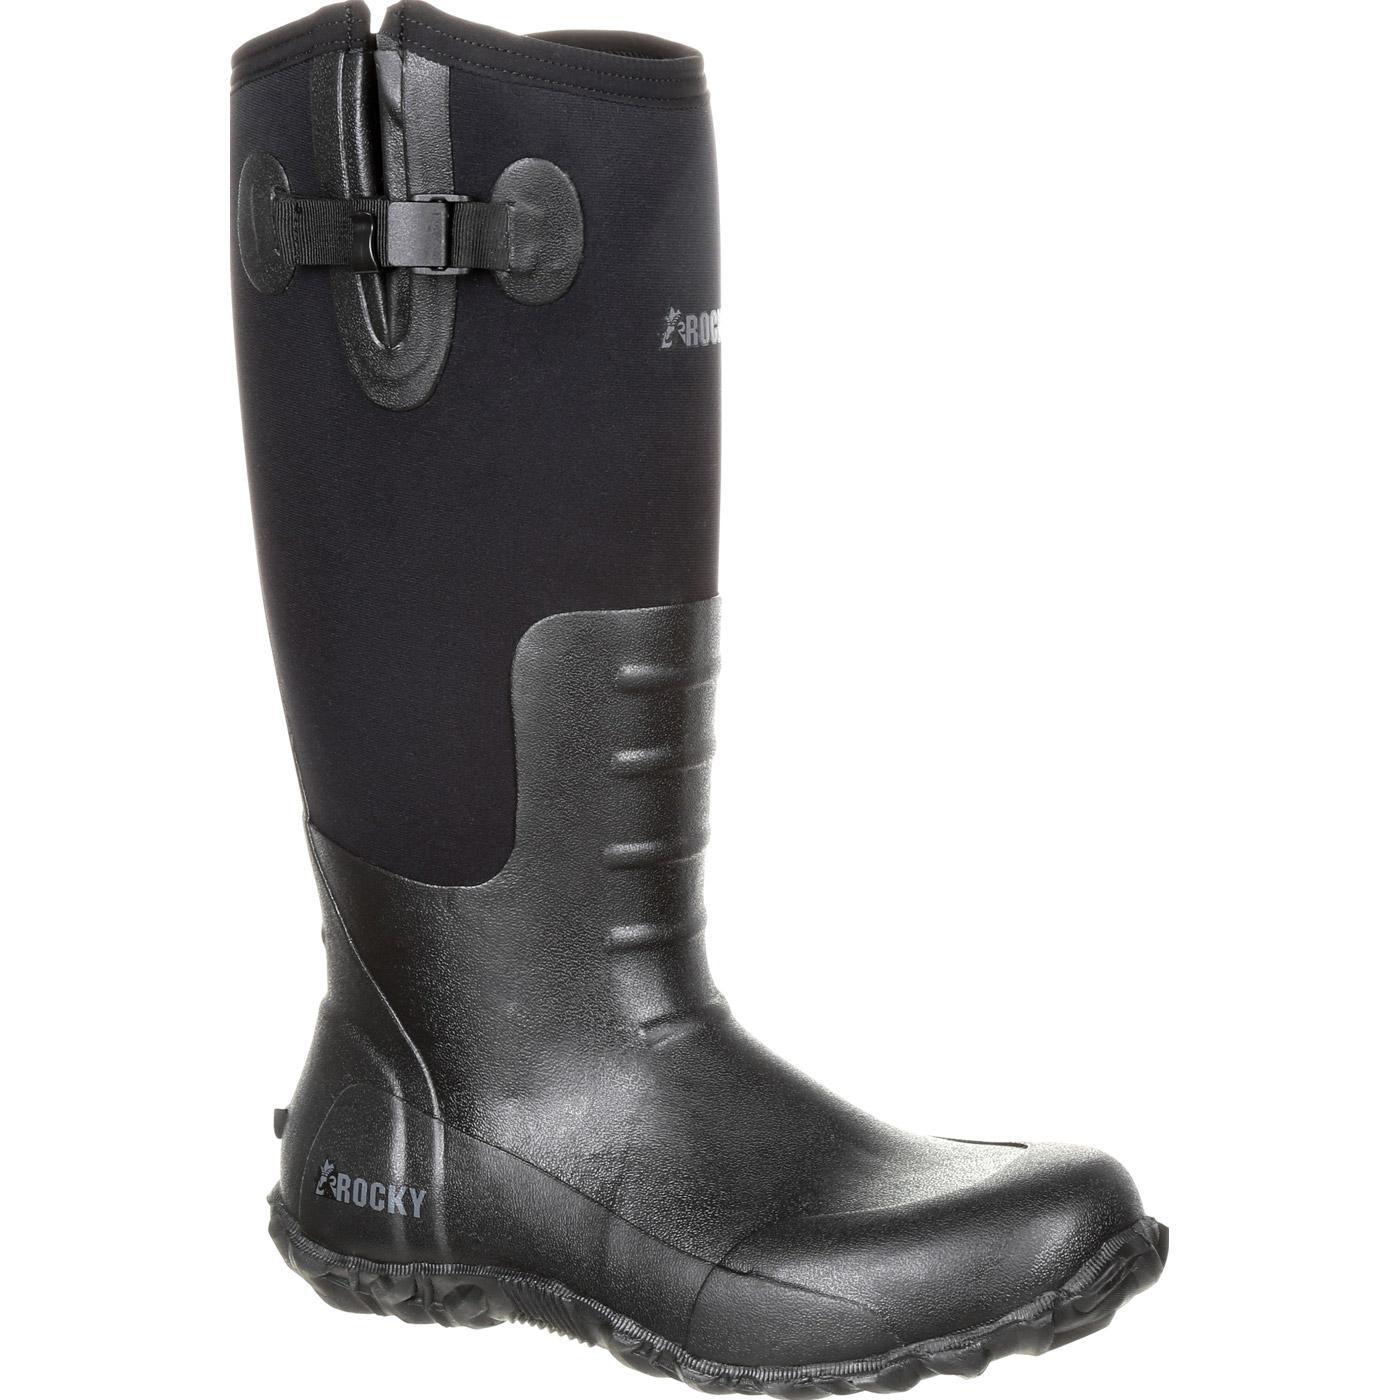 Medium Gears Rain Boot Cover Ripple Rubber Sole Protective Gear